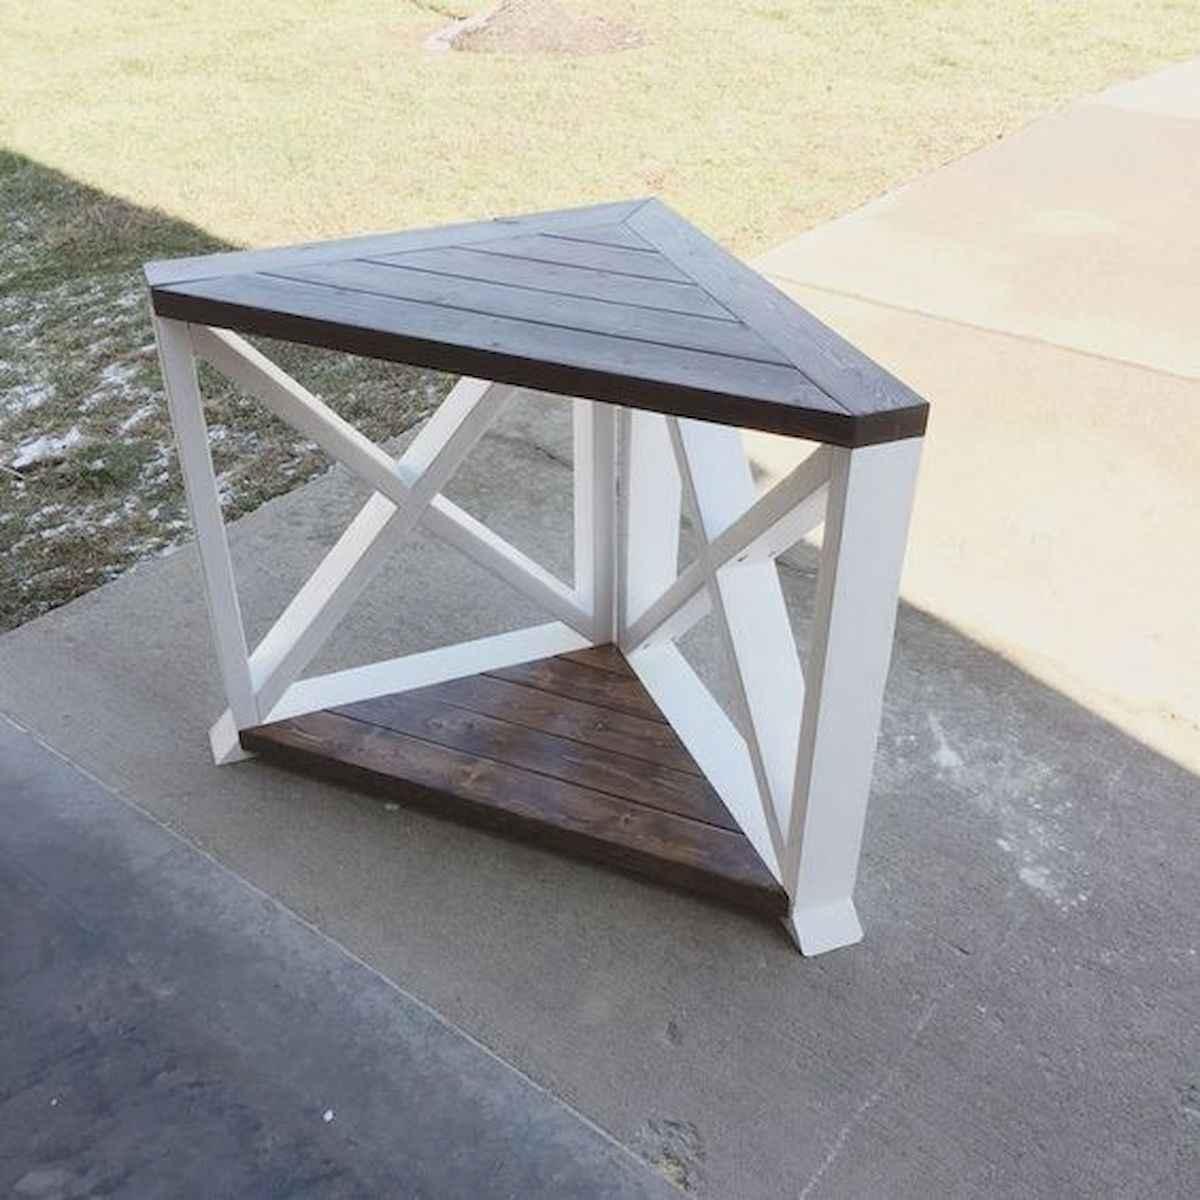 60 Fantastic DIY Projects Wood Furniture Ideas (42)